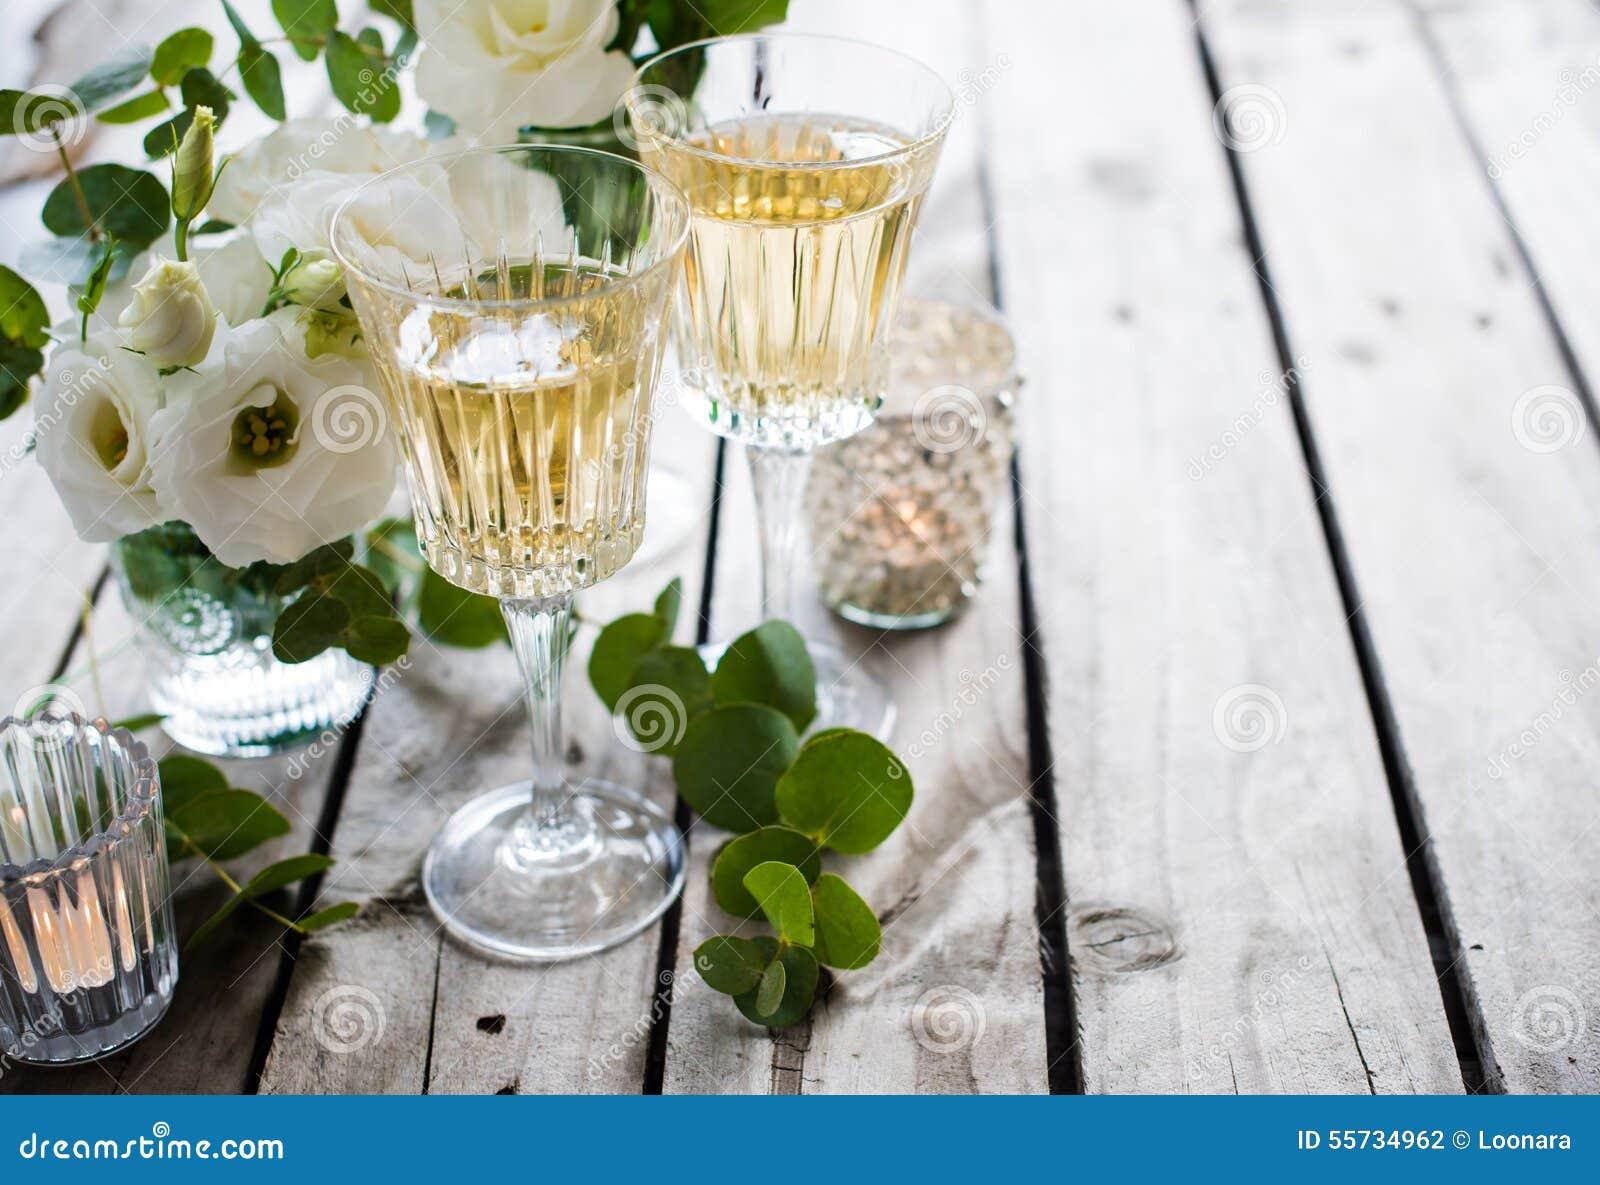 Summer wedding table decor stock photo. Image of light - 55734962